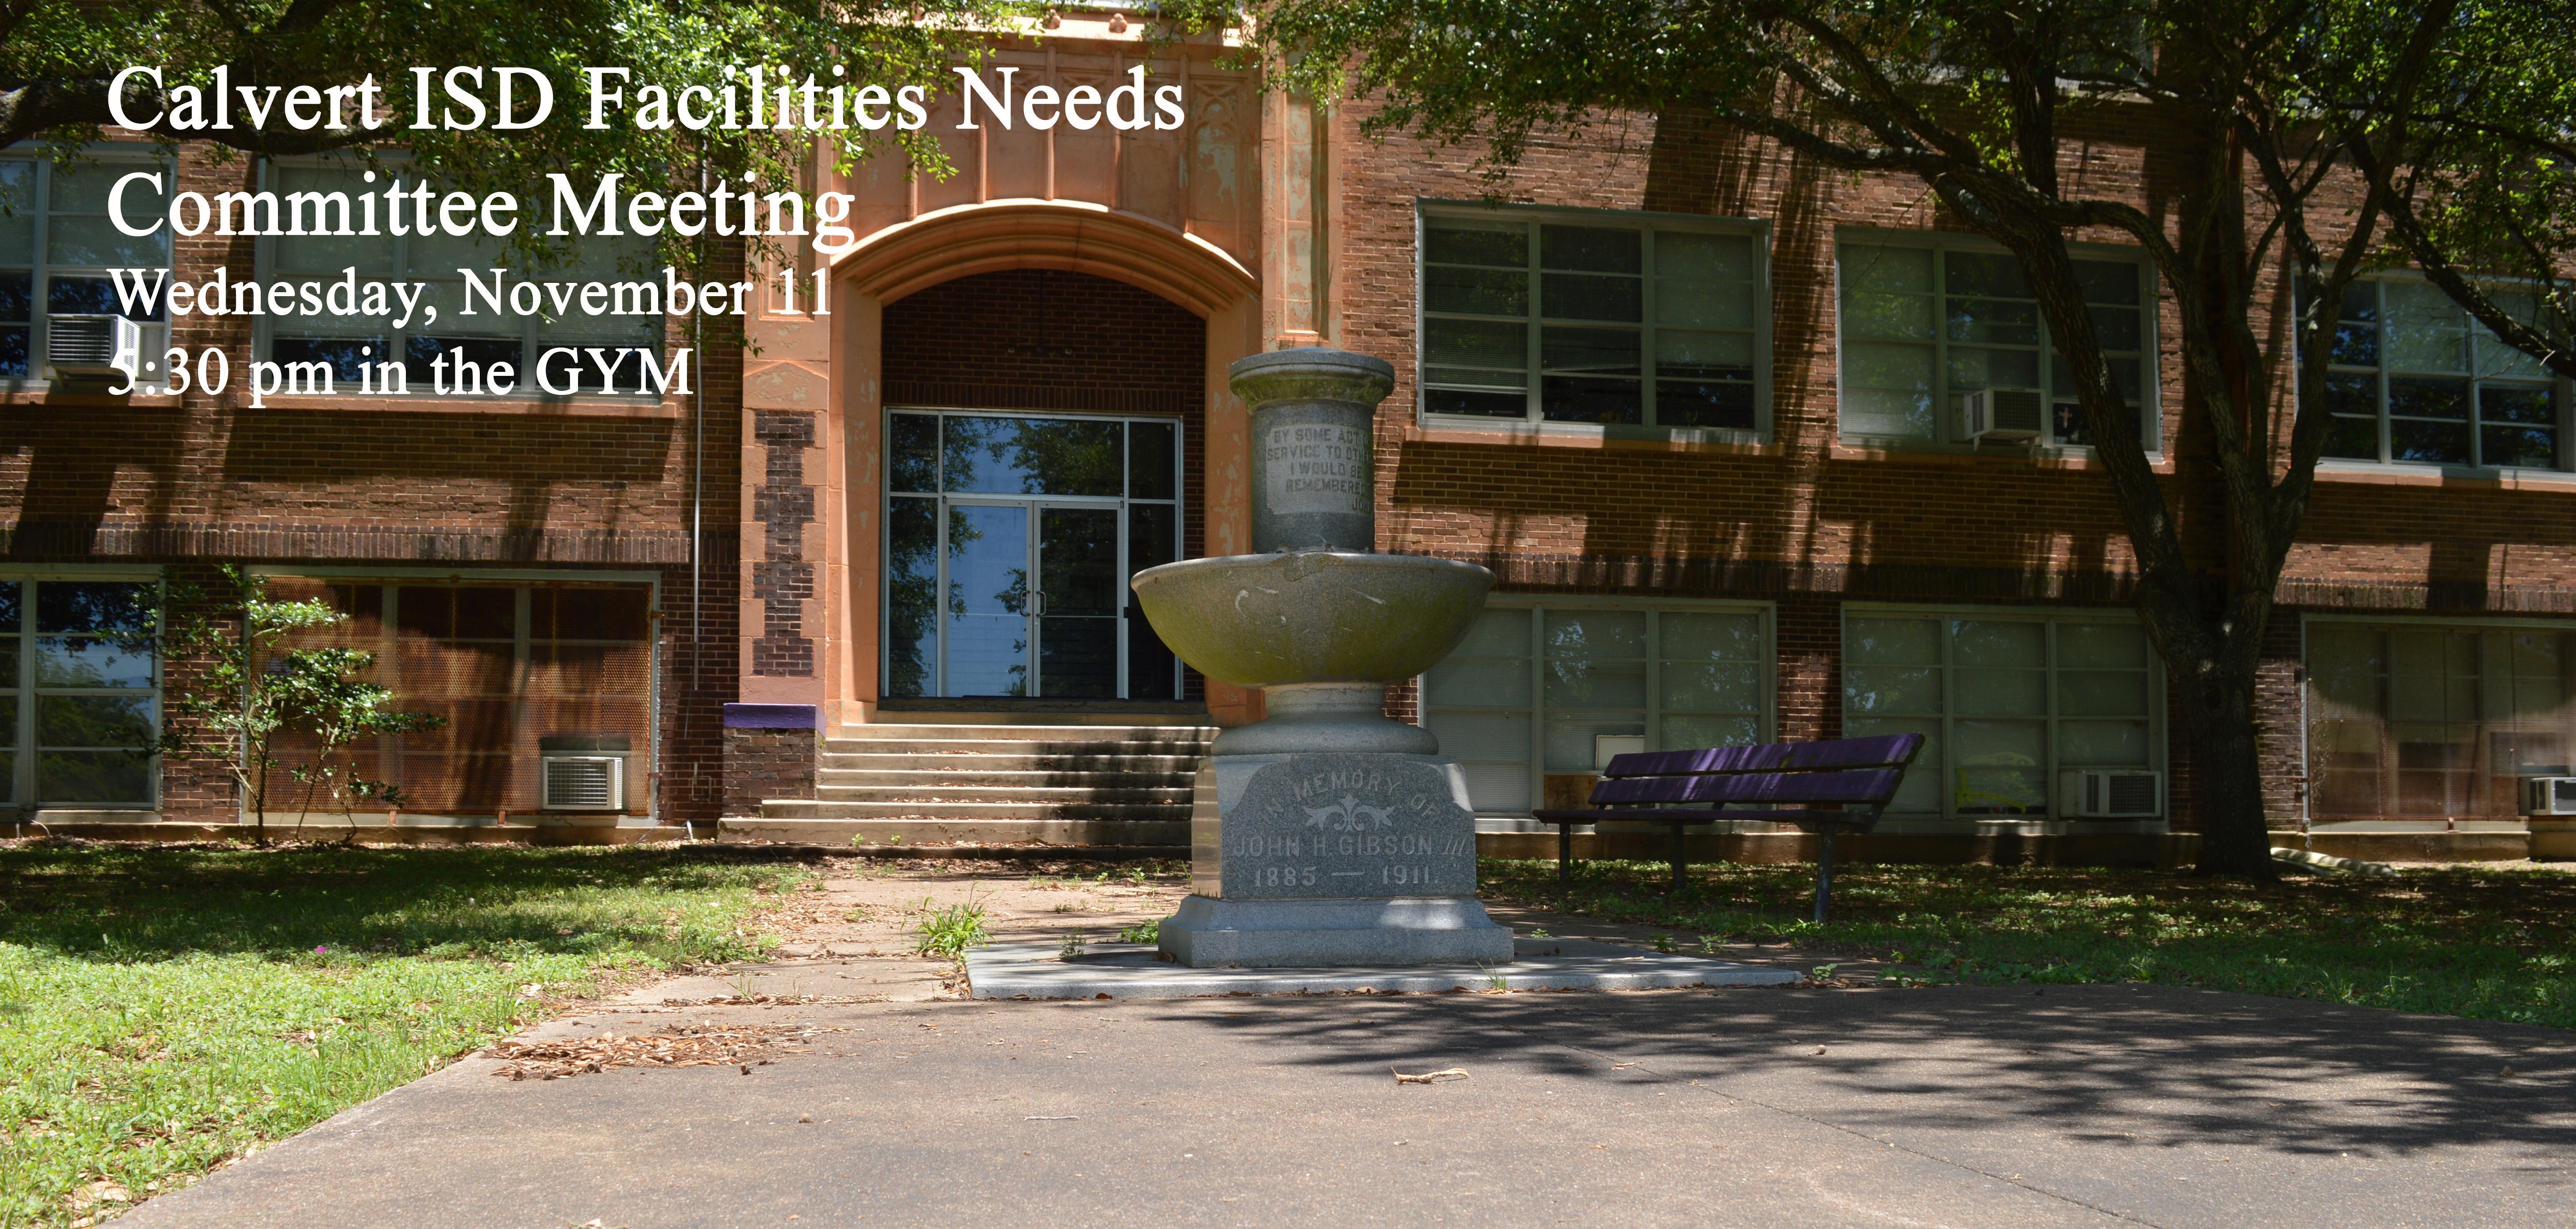 Calvert ISD Facilities Needs Committee Meeting Image